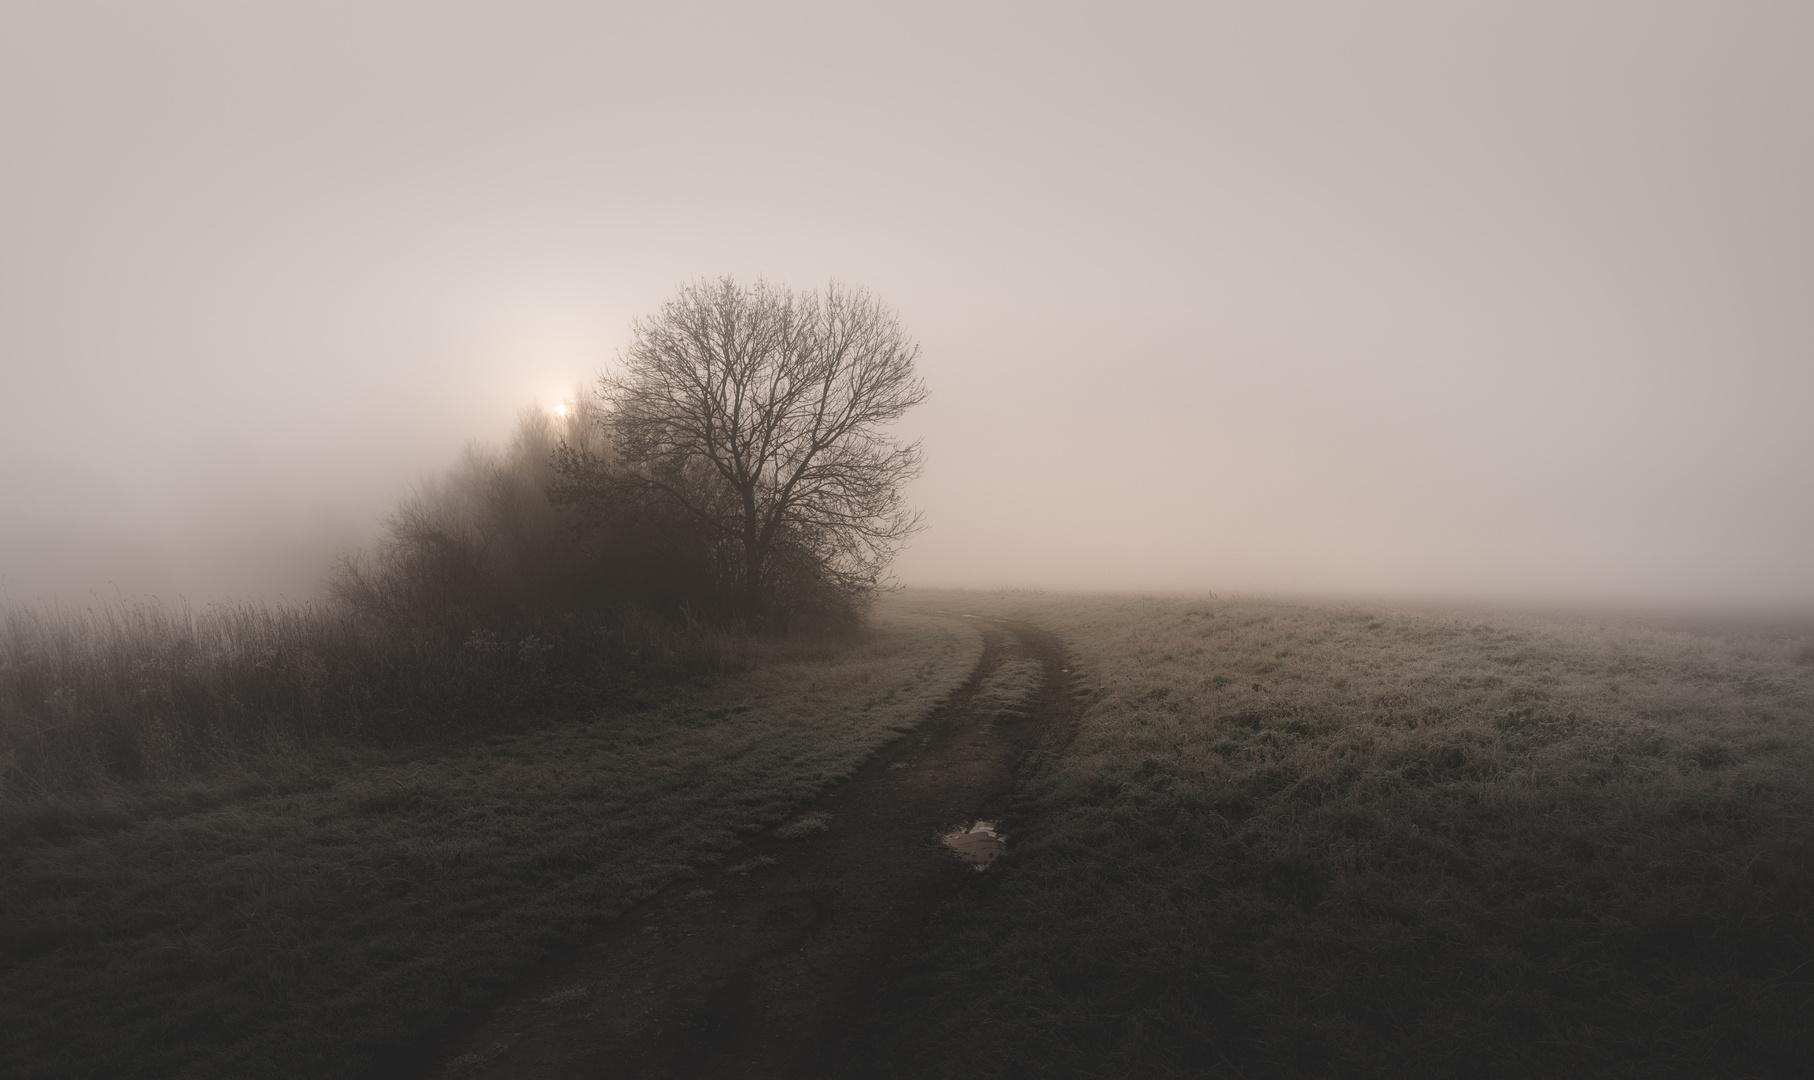 * Dezember Nebel *